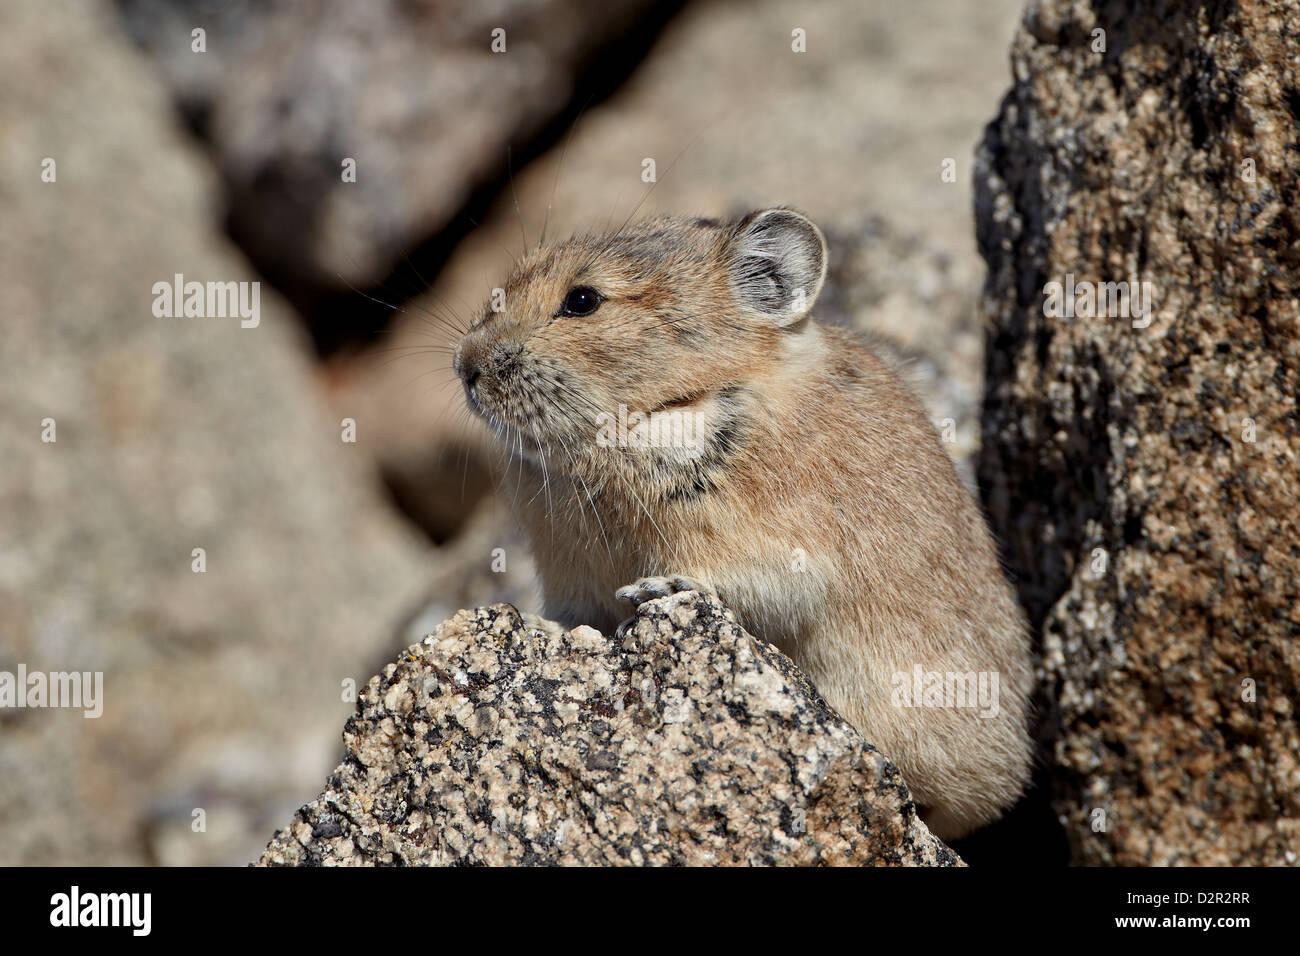 American pika (Ochotona princeps), Mount Evans, Arapaho-Roosevelt National Forest, Colorado, USA - Stock Image